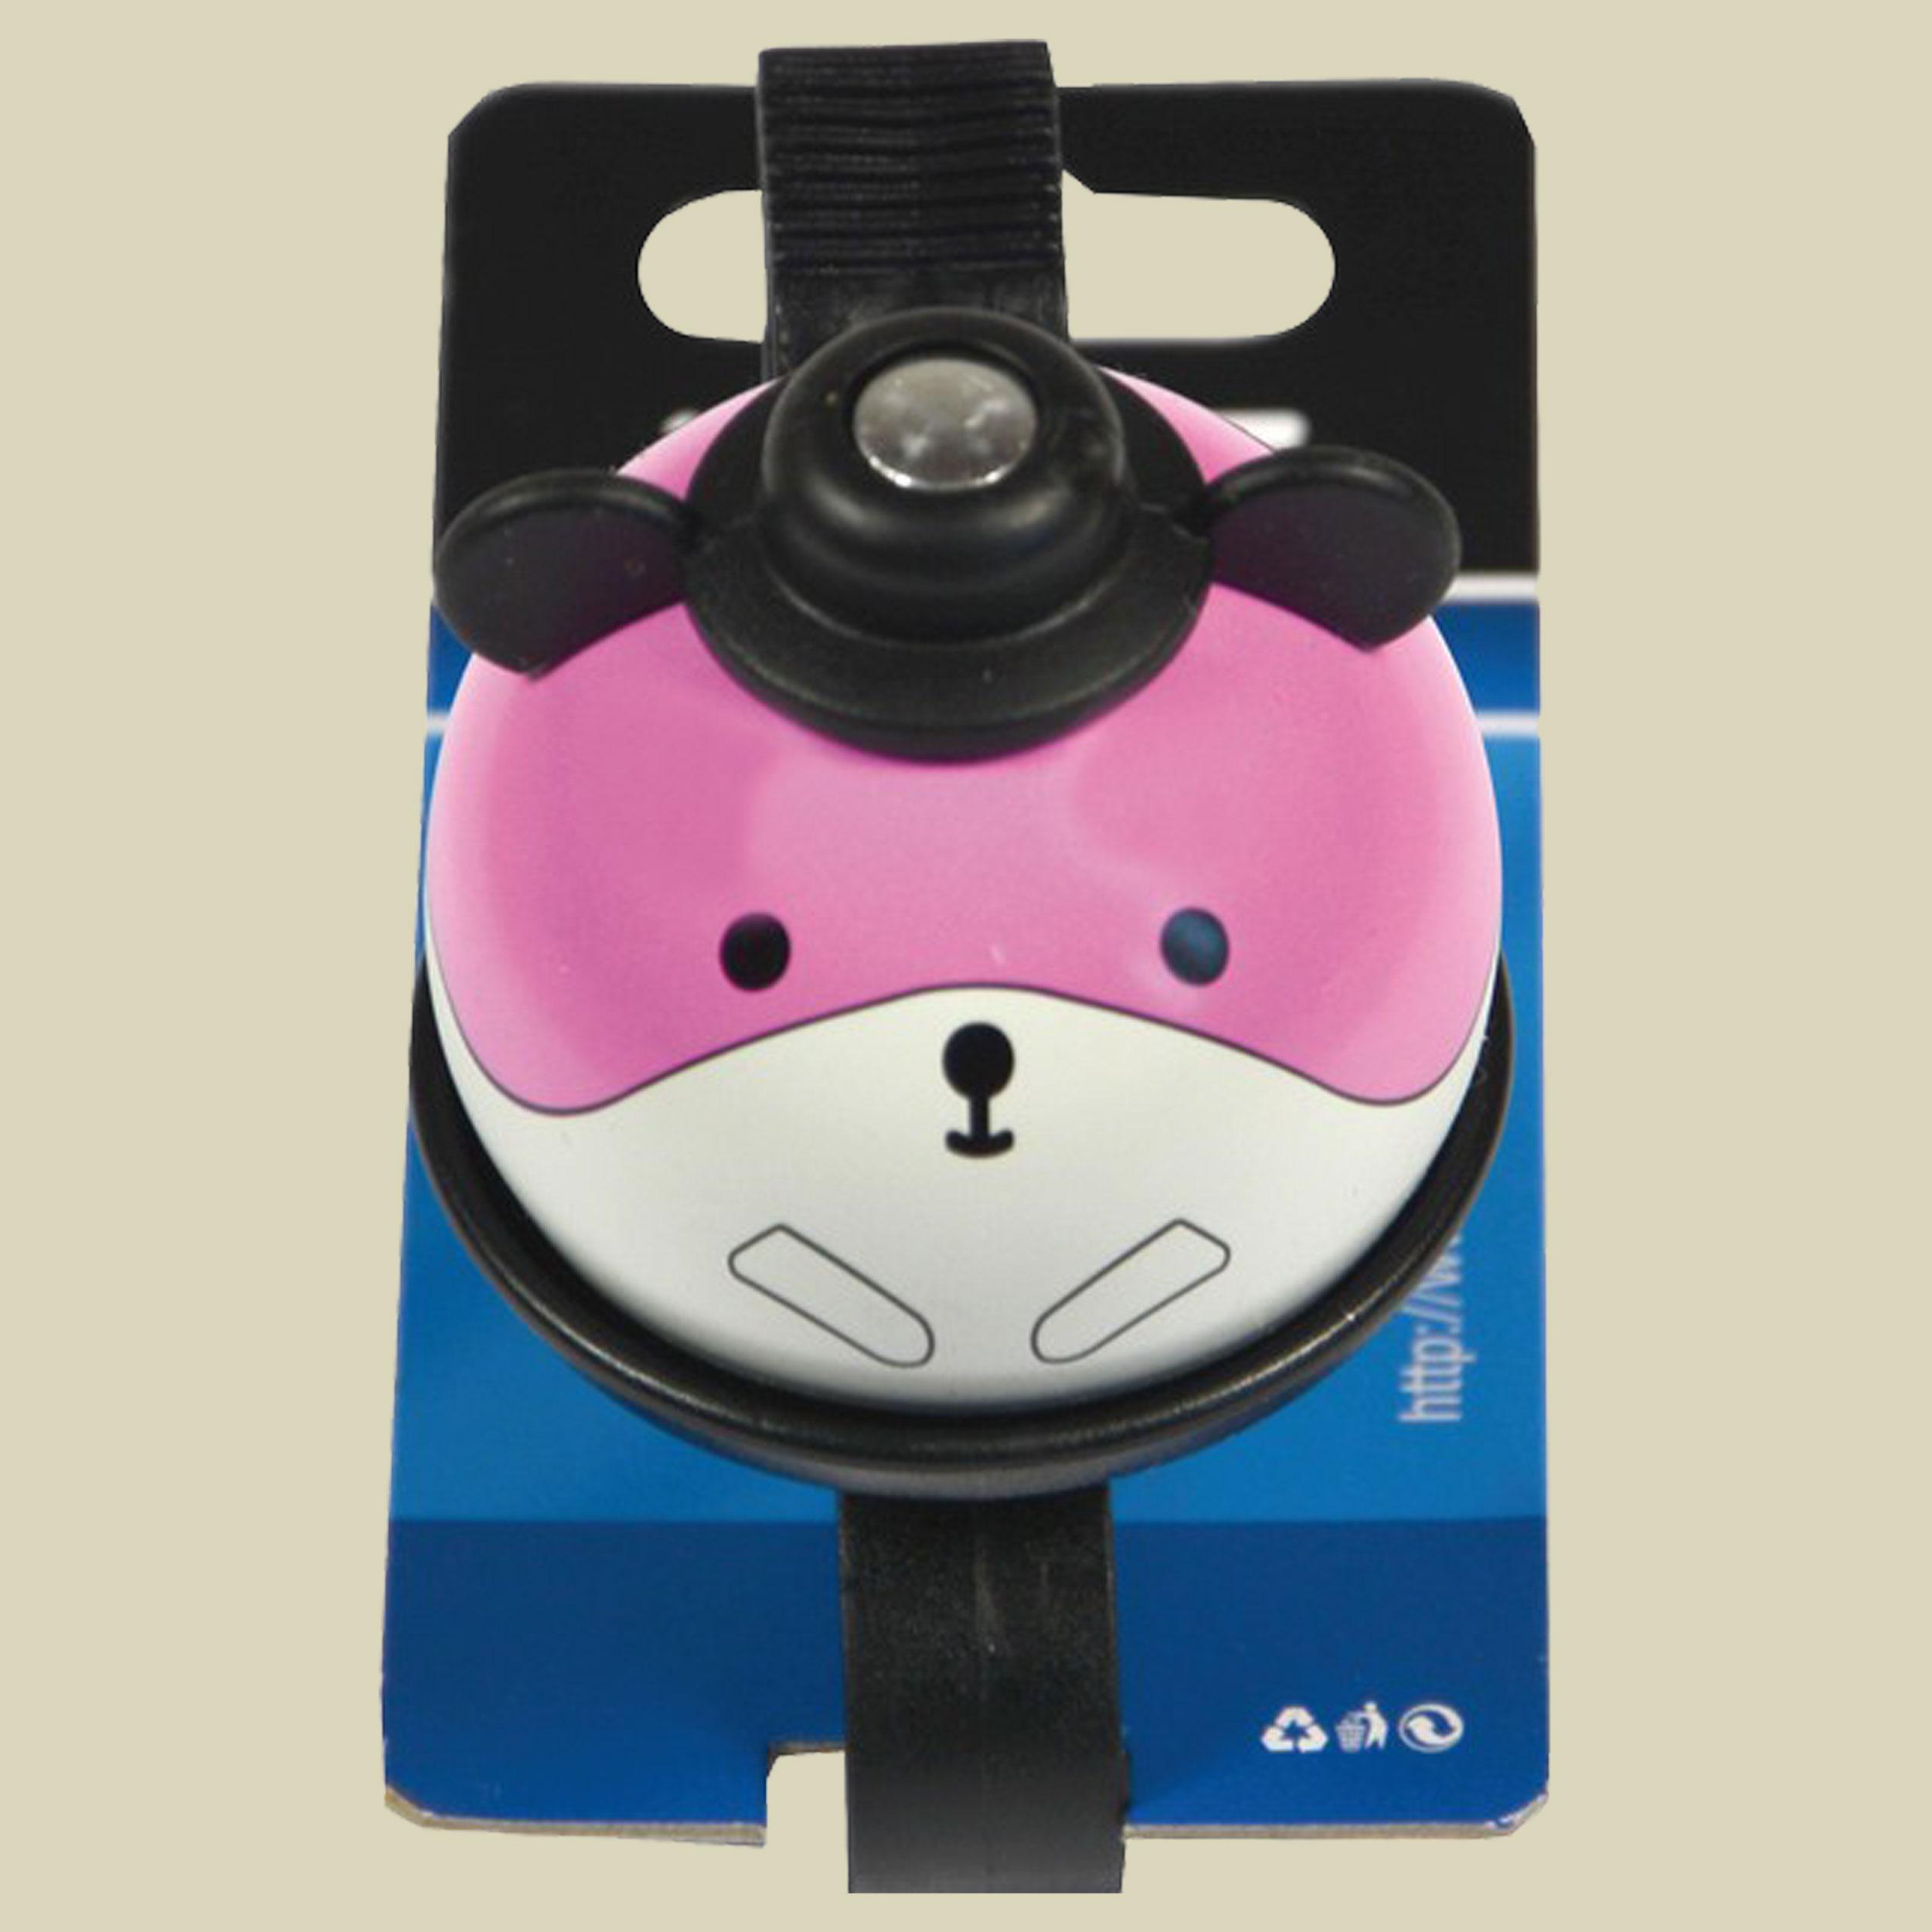 XLC XLC Kinderglocke Maus Fahrradklingel f'r Kinder Maus pink